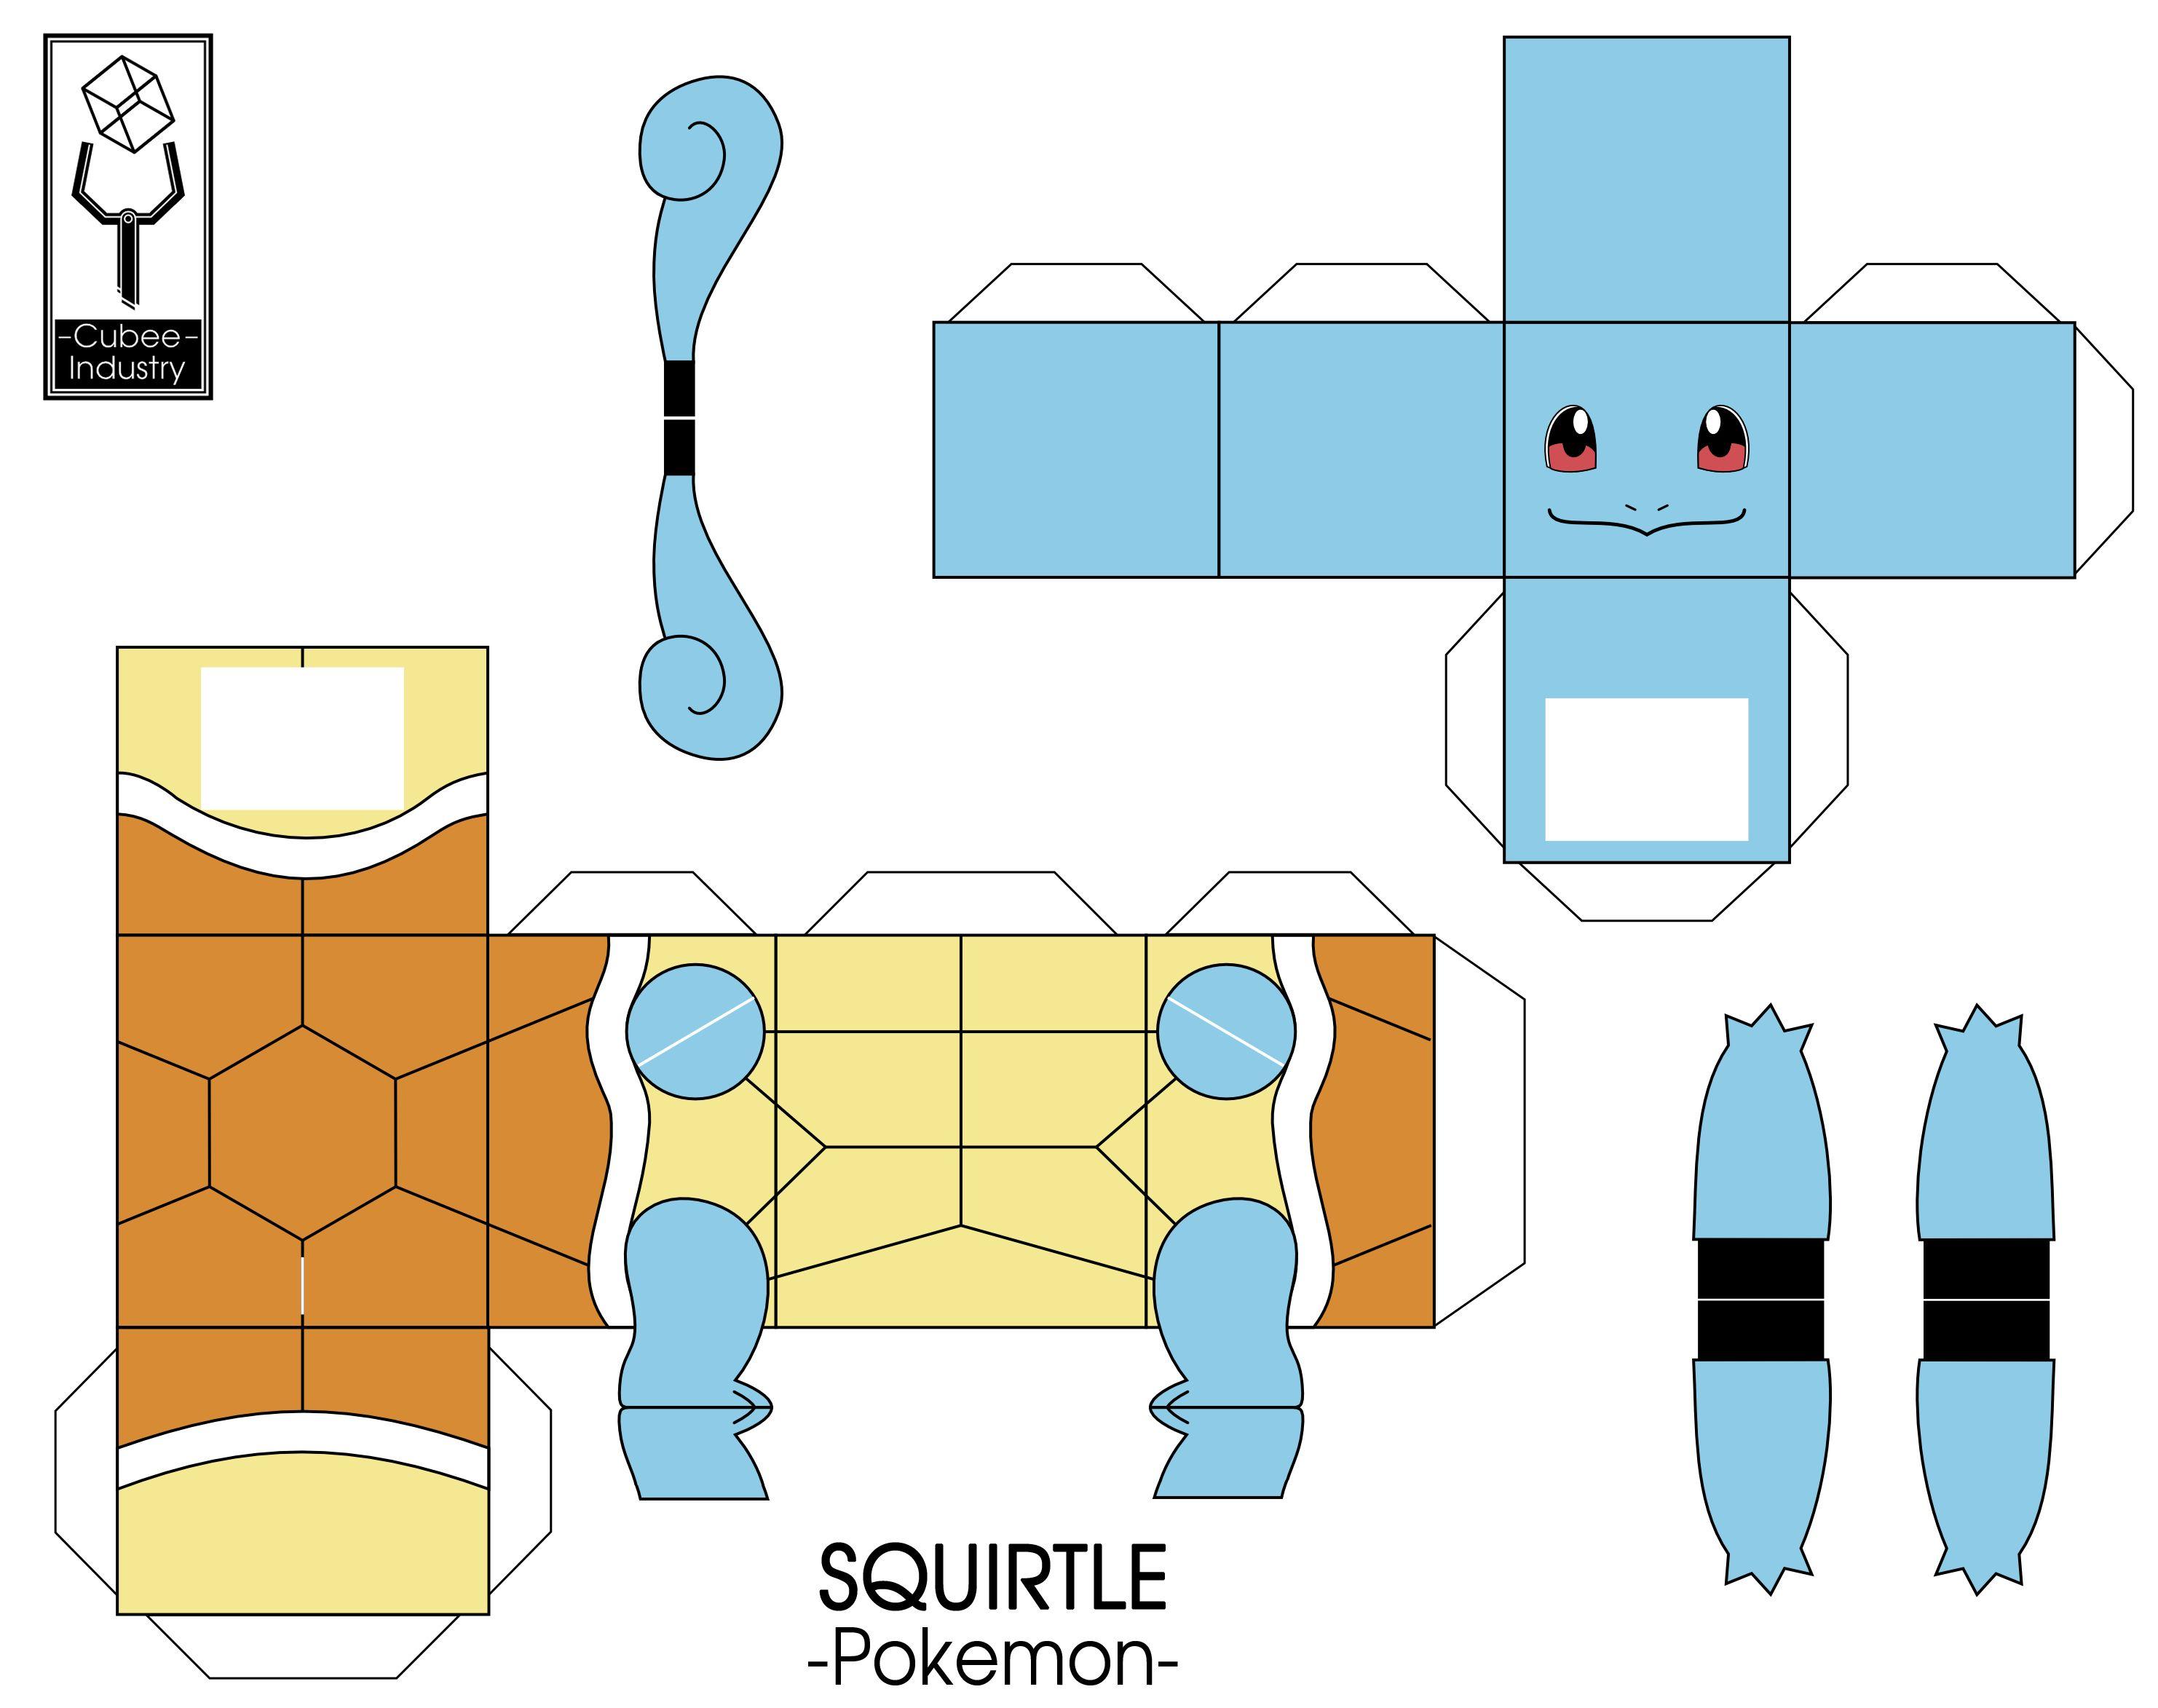 Pokemon origami - Easy origami Pokemon squirtle - YouTube | 2346x2964